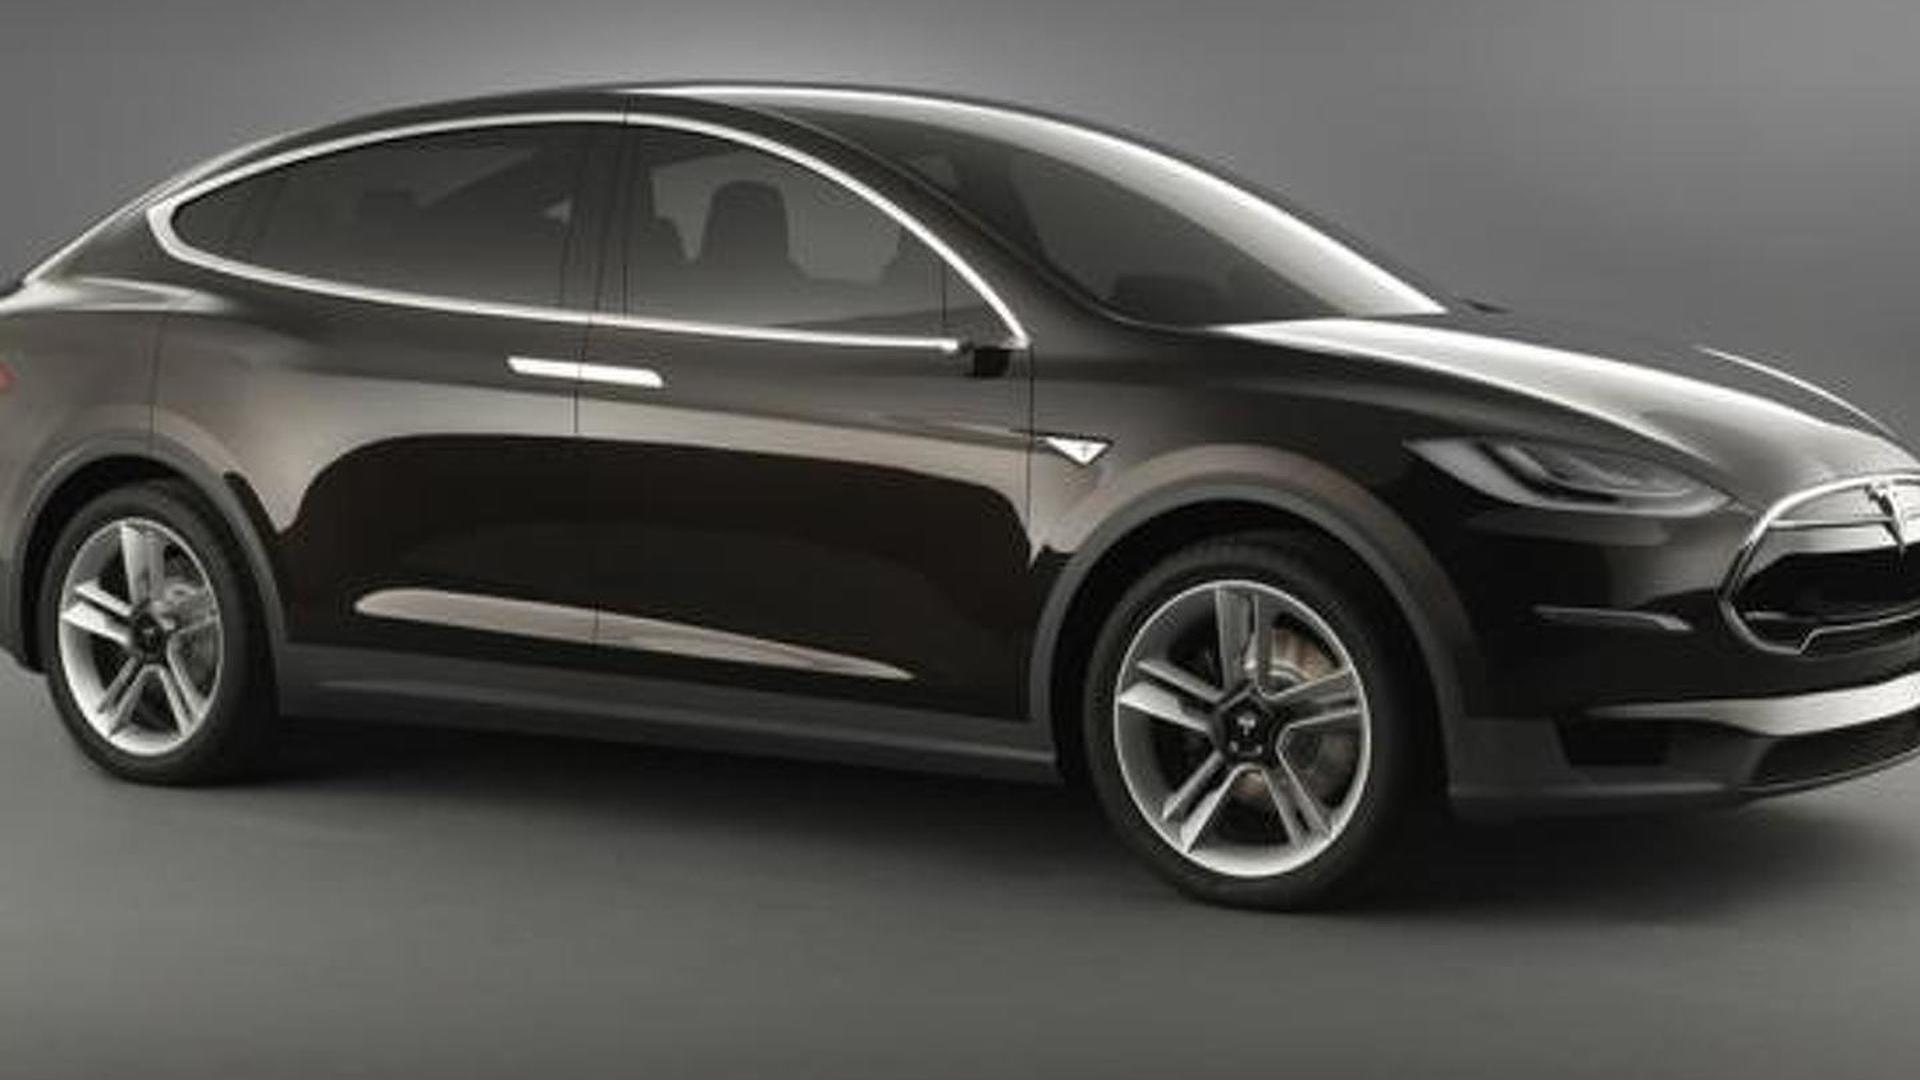 Tesla Motors planning electric supercar, truck and self-driving models